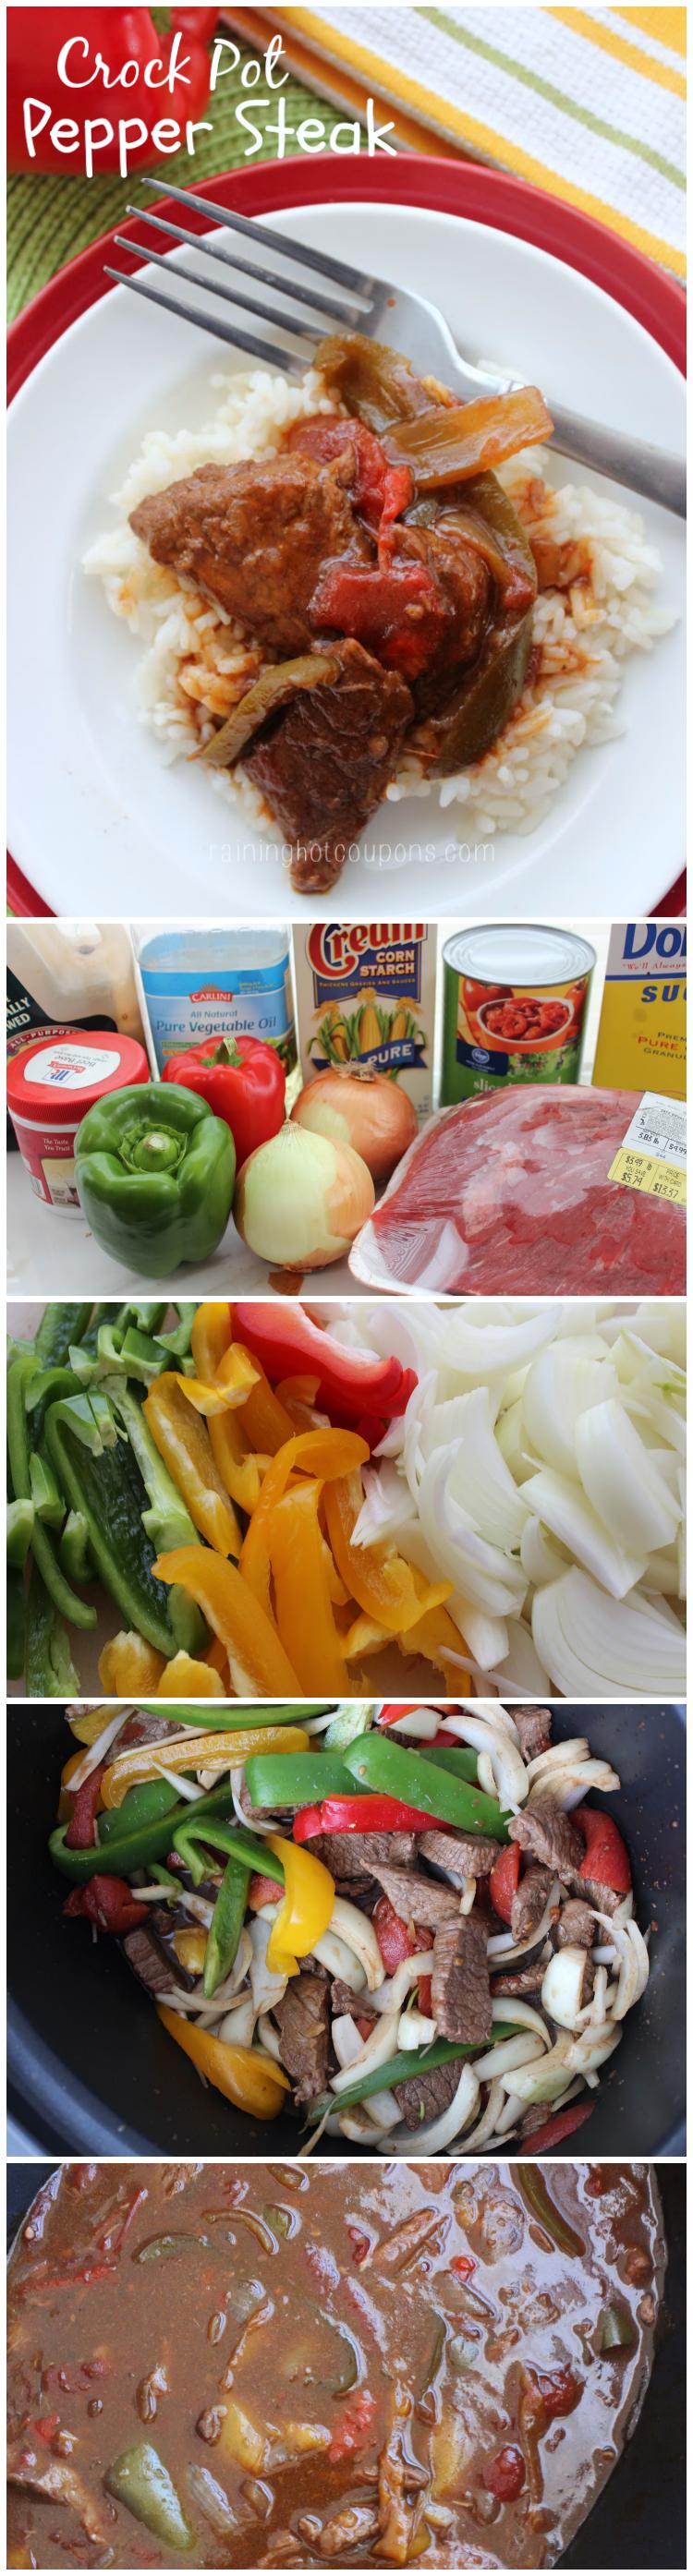 crock pot pepper steak collage